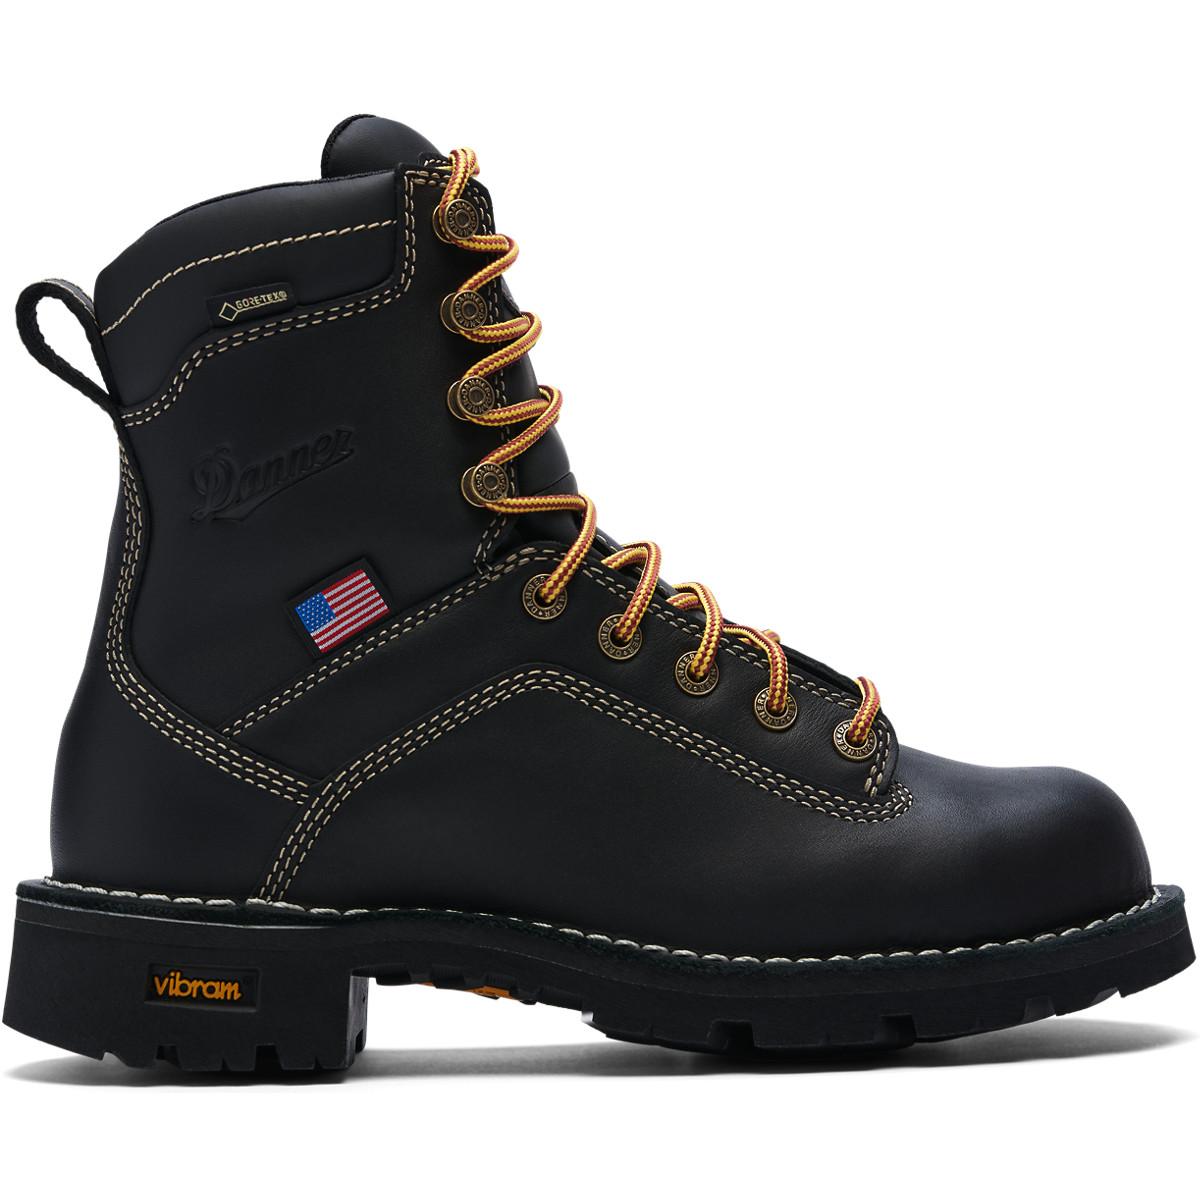 ccfbdb5646e9 Danner - Women s Quarry USA Black Alloy Toe